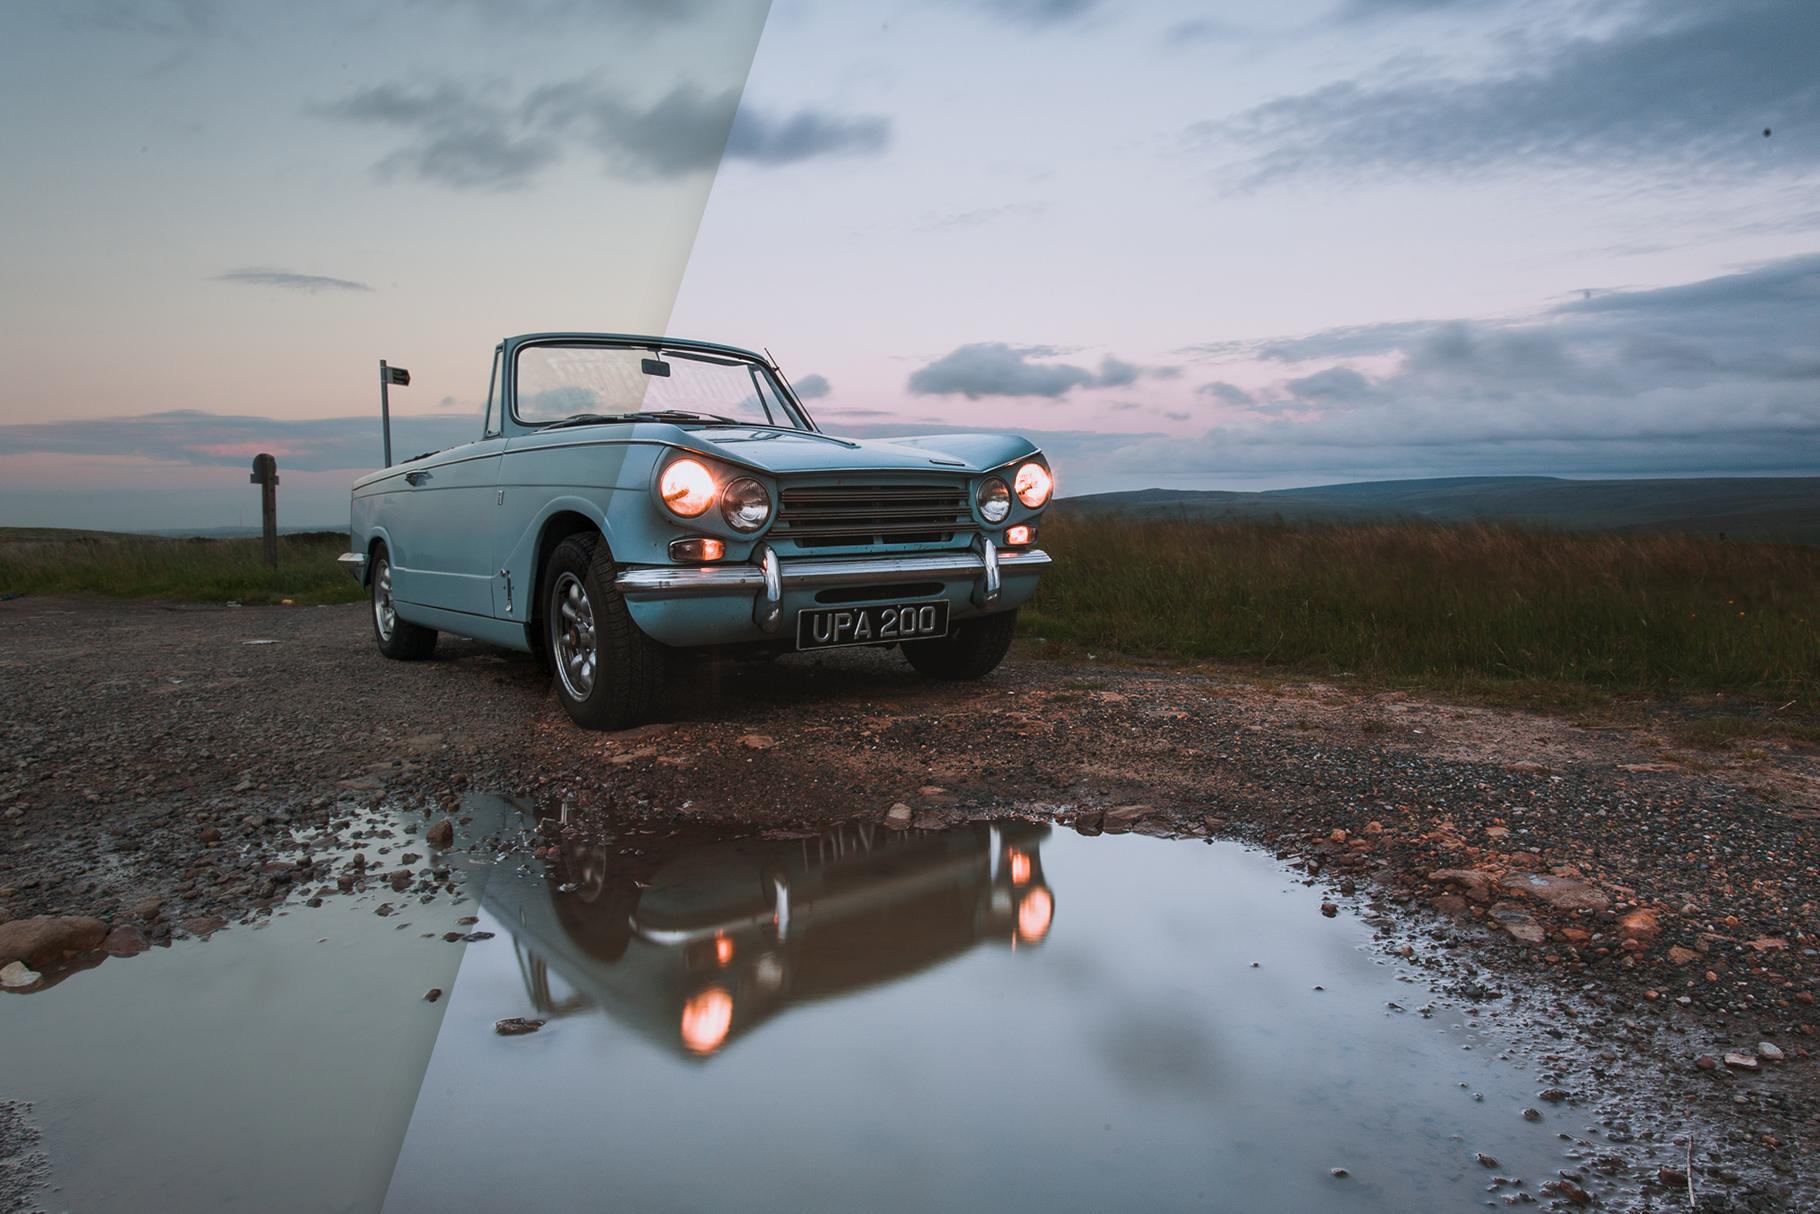 Best Lightroom Presets for Travel & Landscape Photography example image 20